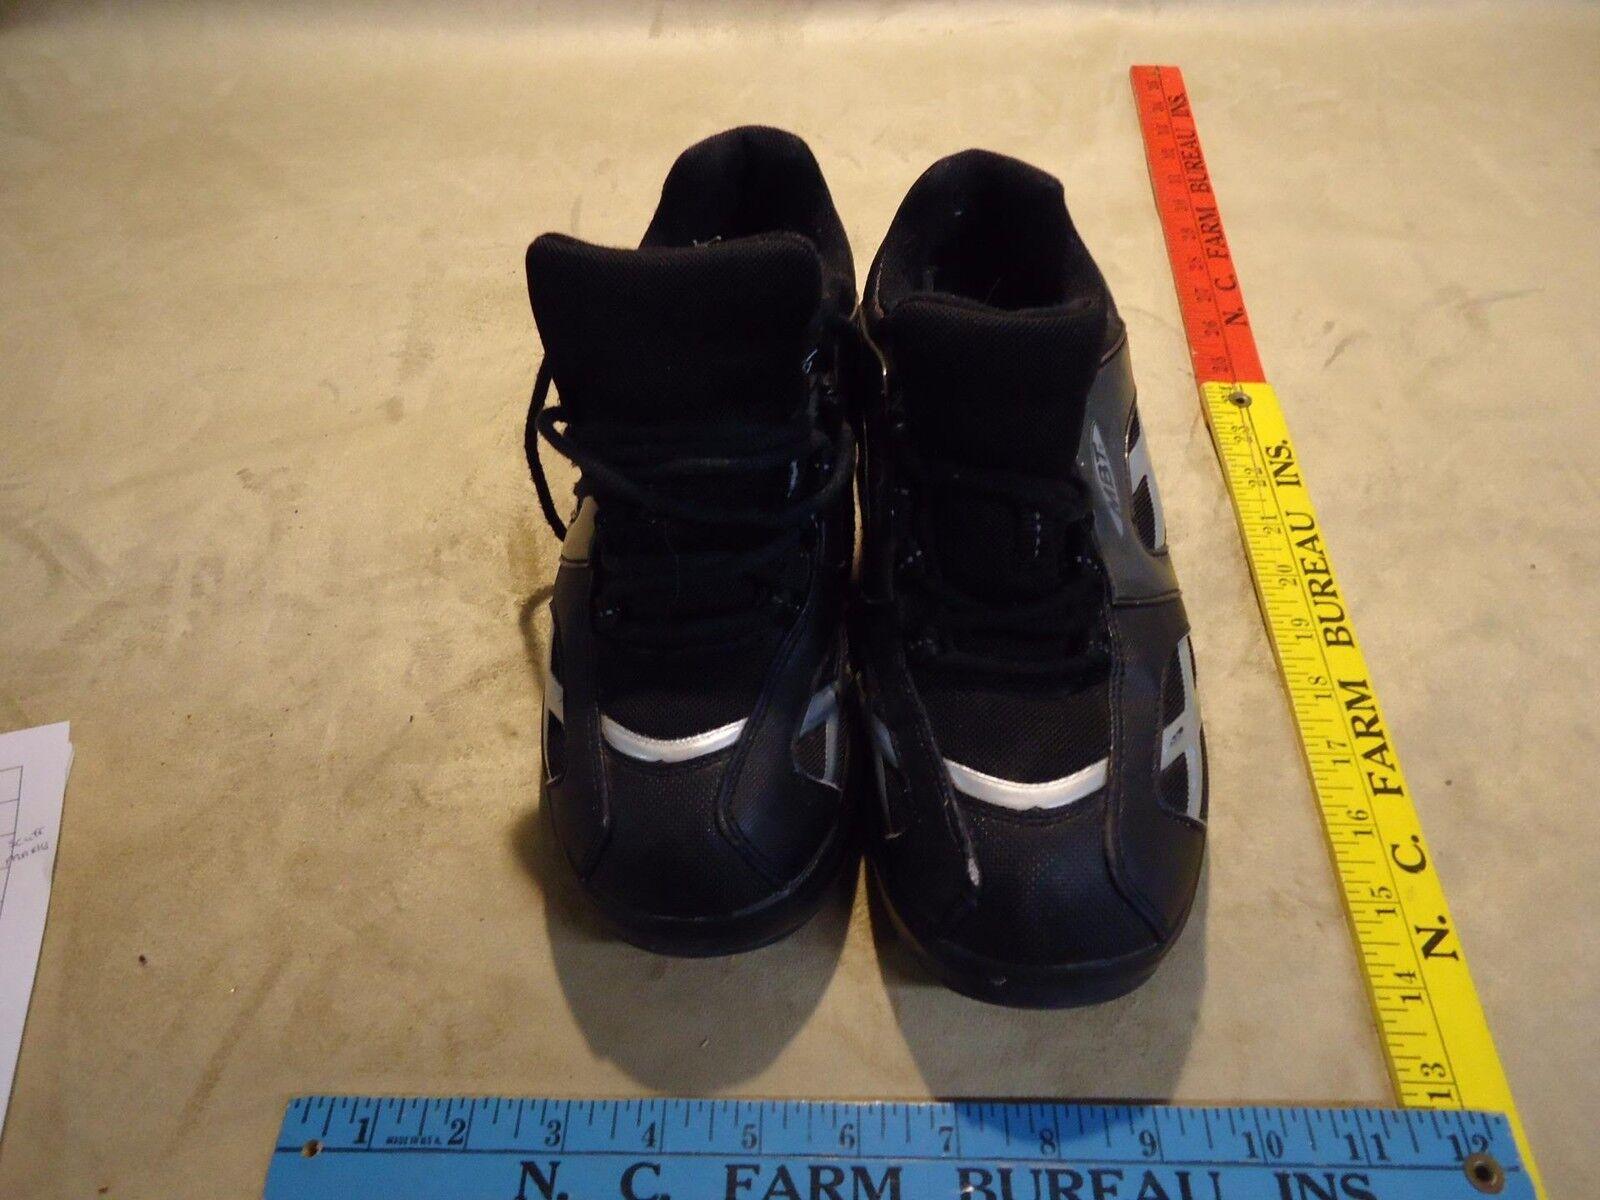 MBT Leather  Mesh Walking scarpe Sz 9.5 7640124878944  Sito ufficiale